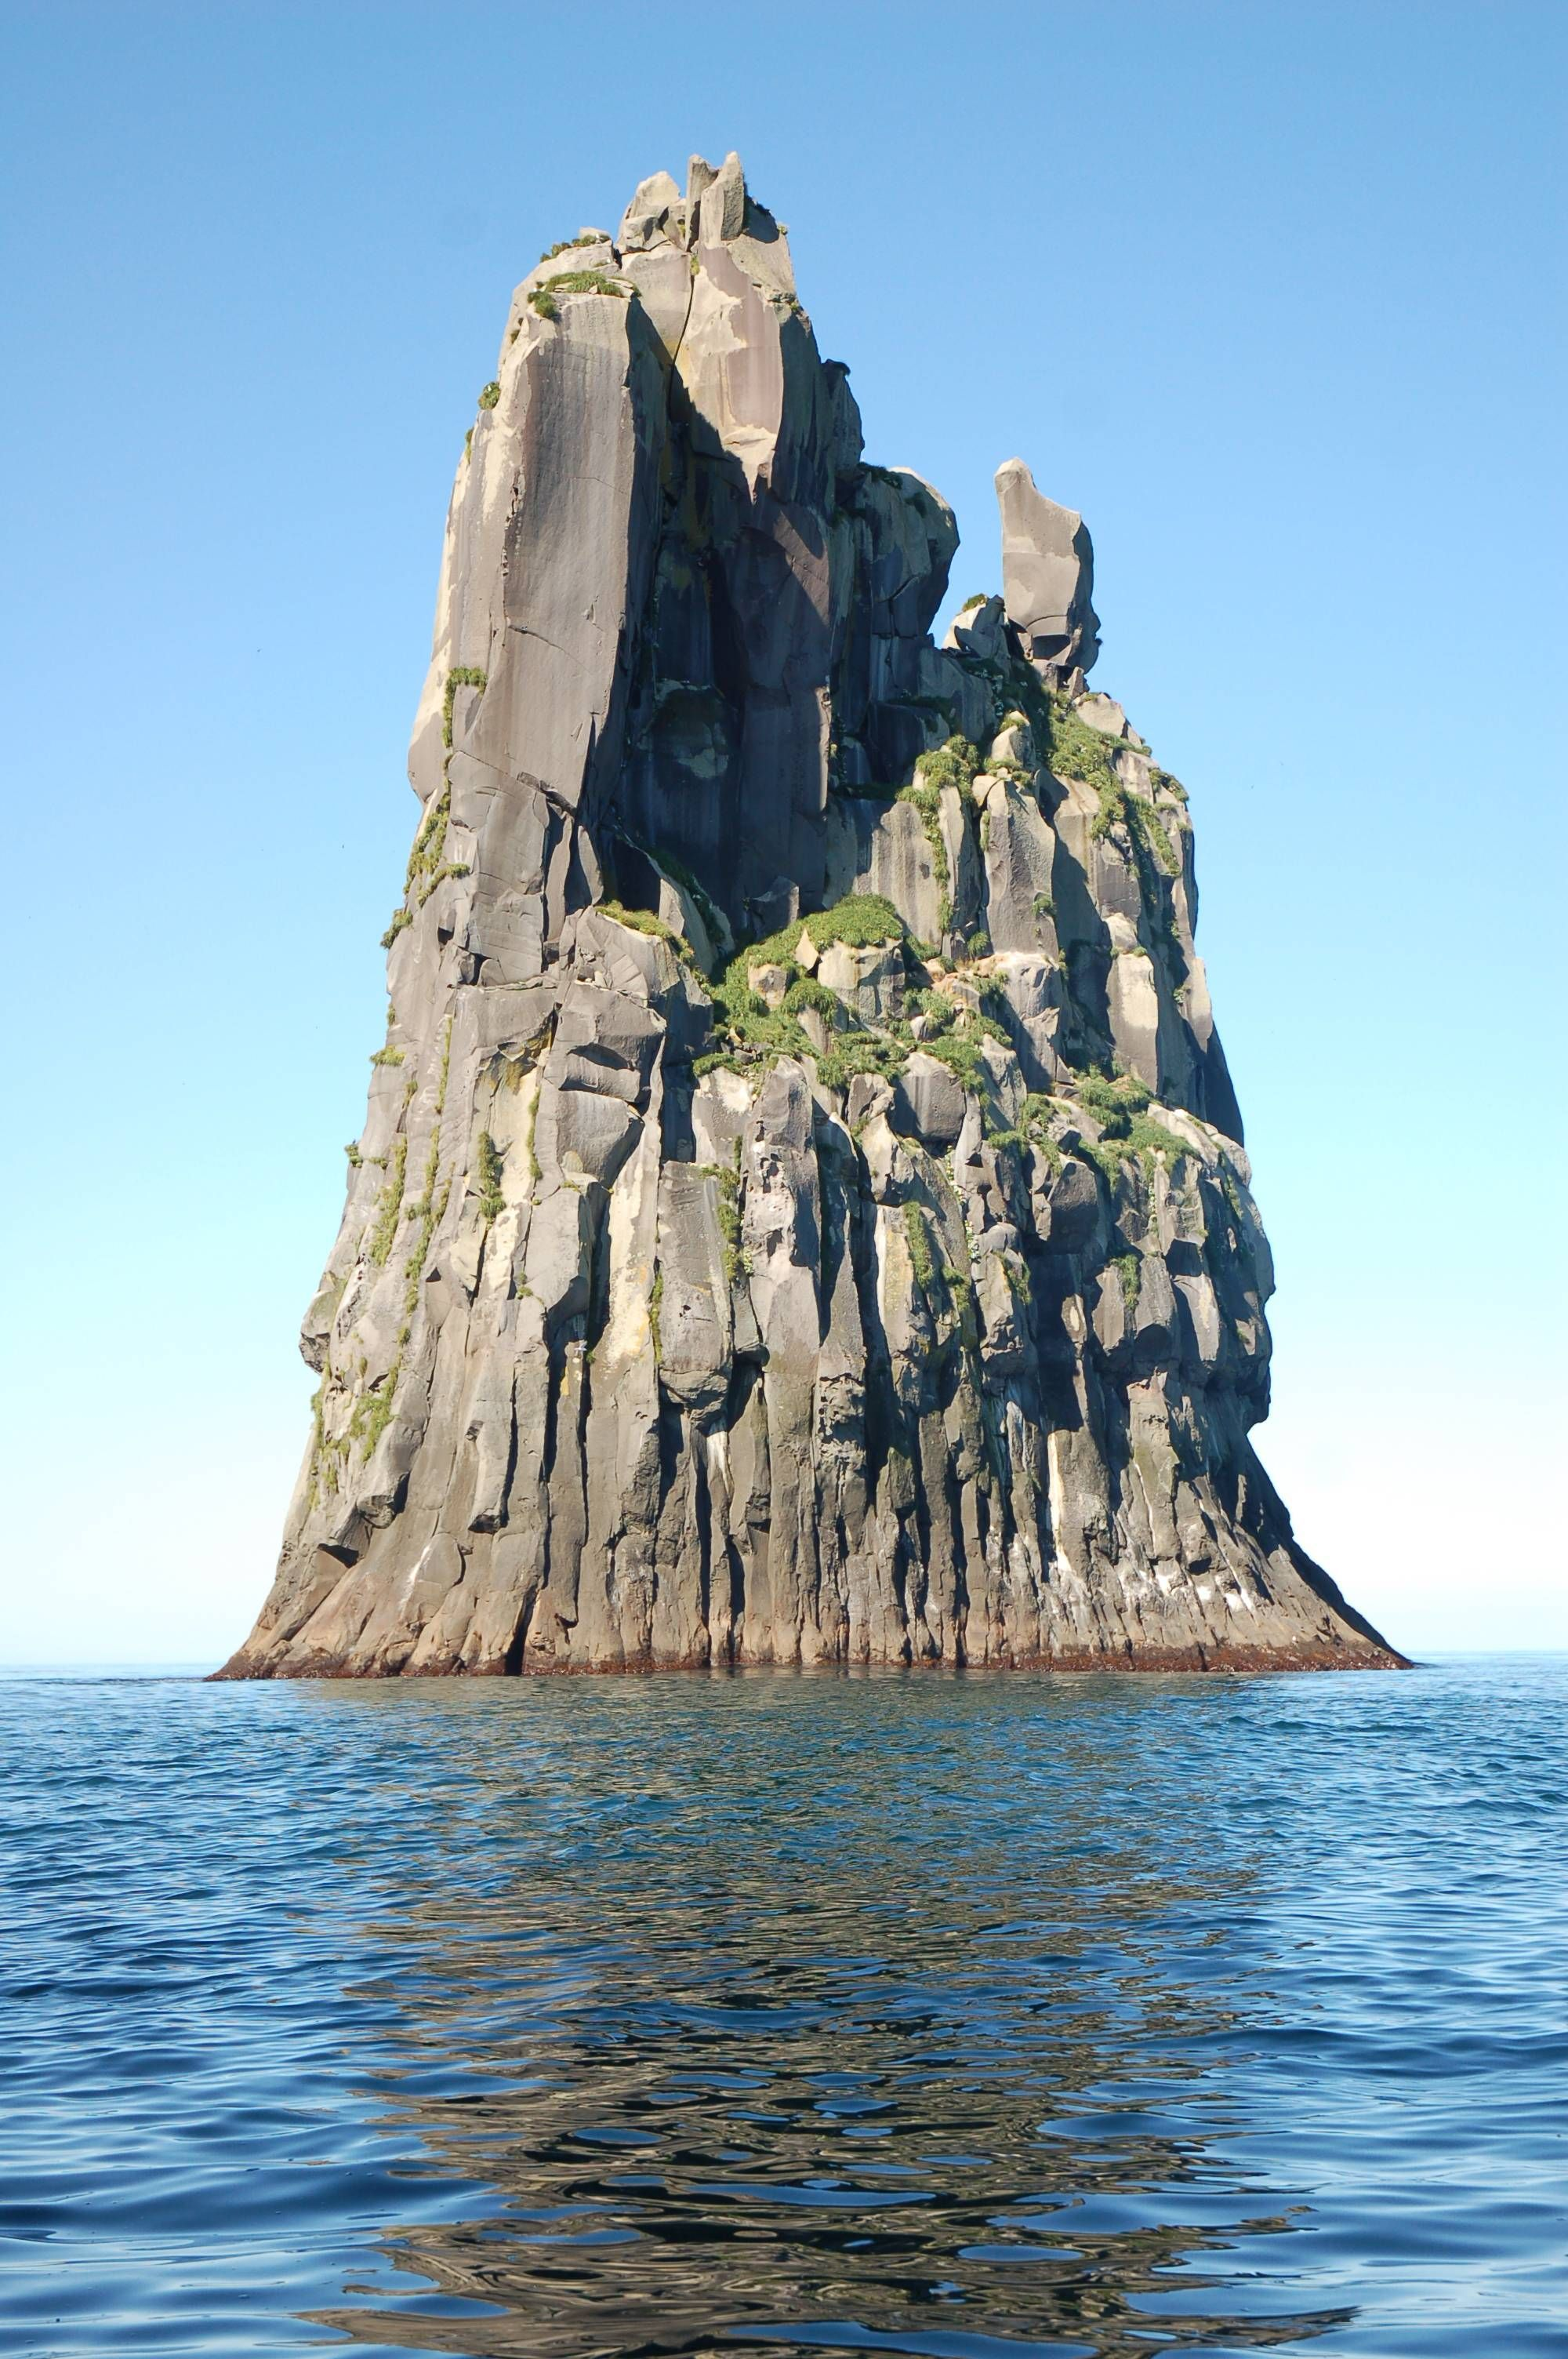 Urup Island, Sea of Okhotsk, Russian Federation